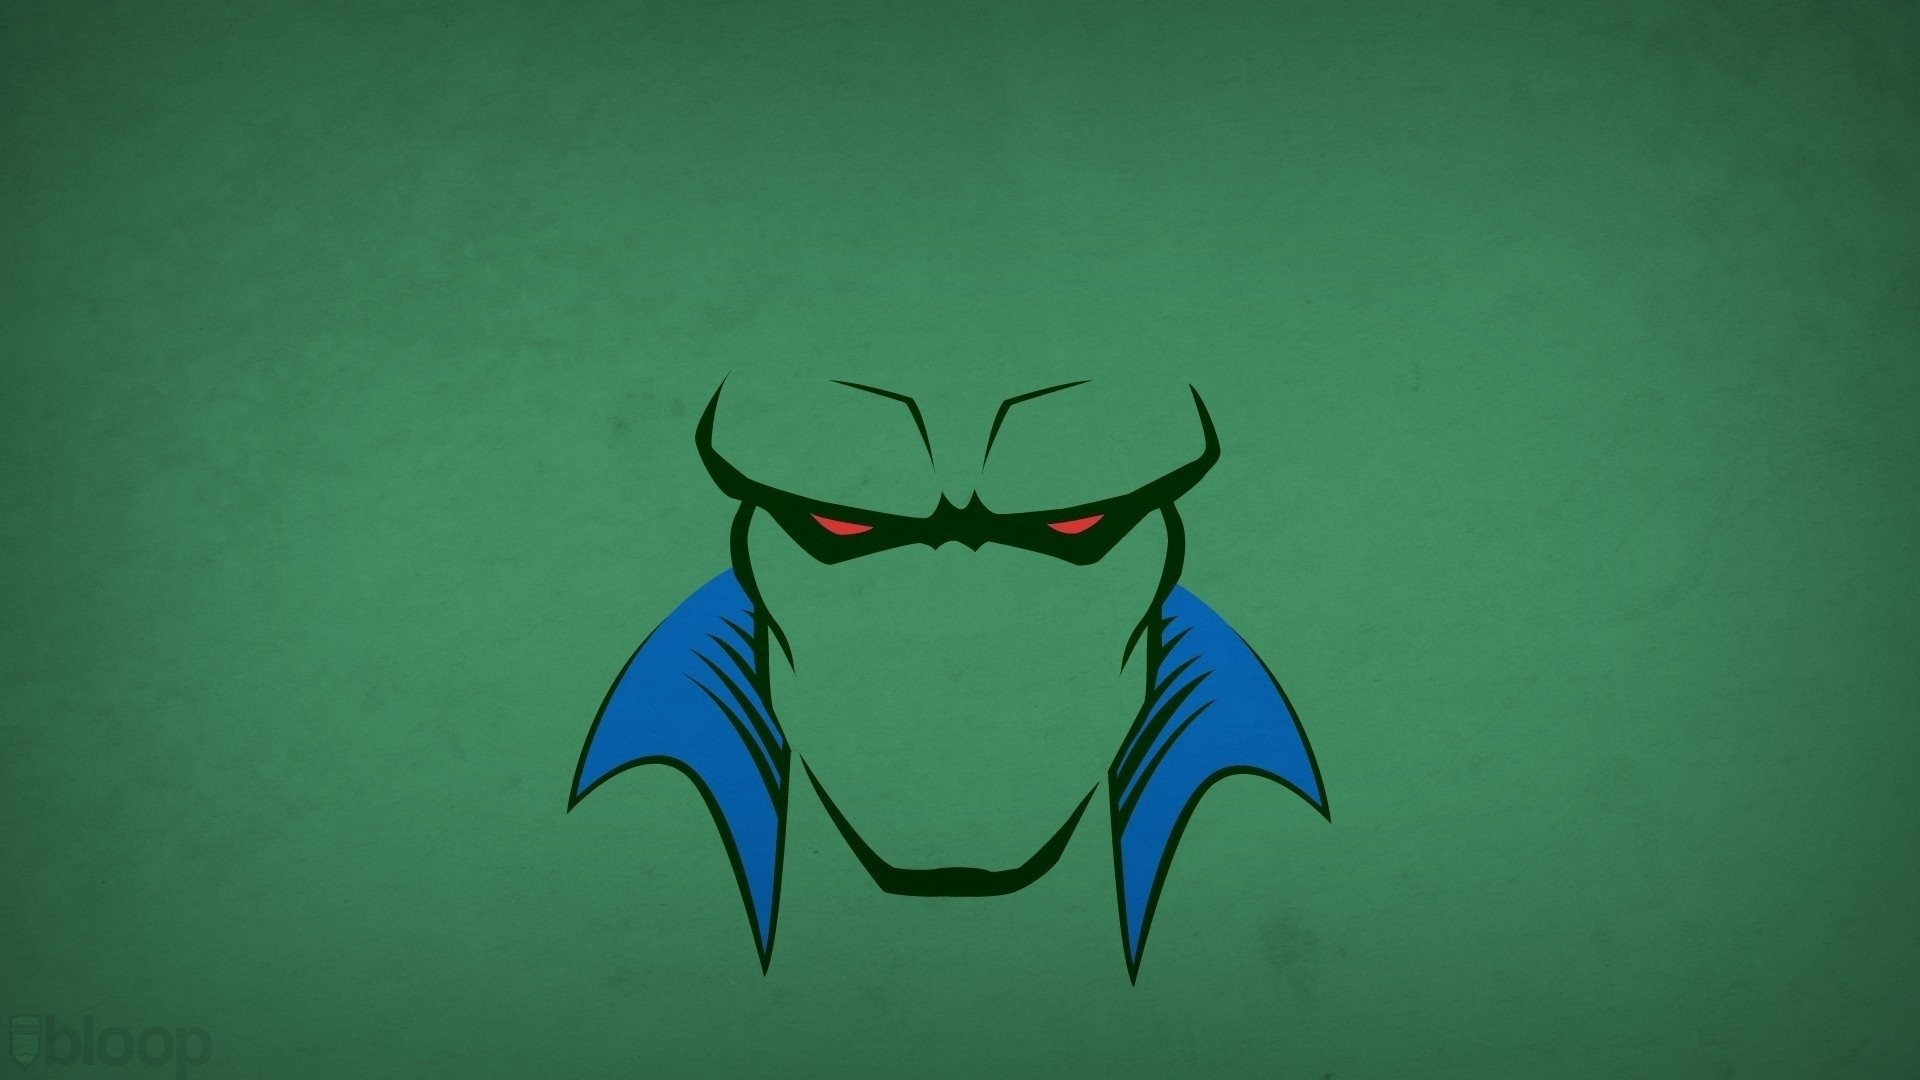 HD Wallpaper   Background ID:471123. Comics Martian Manhunter